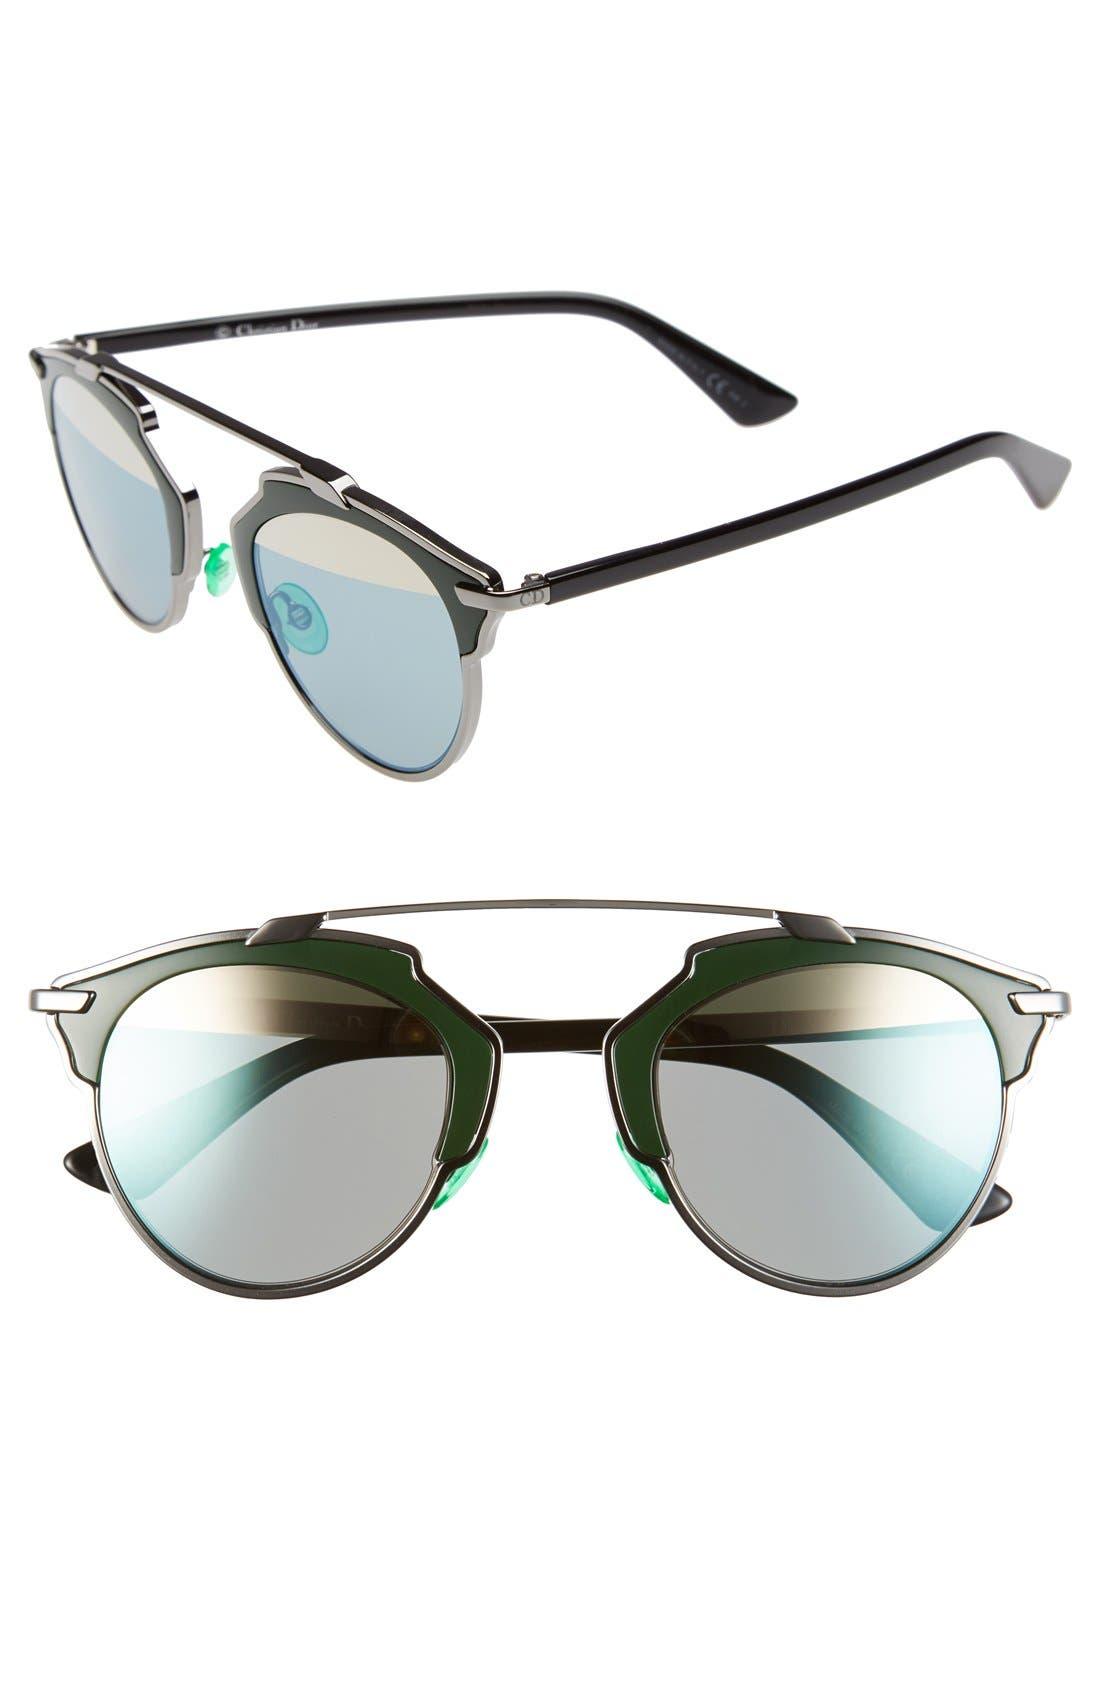 So Real 48mm Brow Bar Sunglasses, Main, color, 045